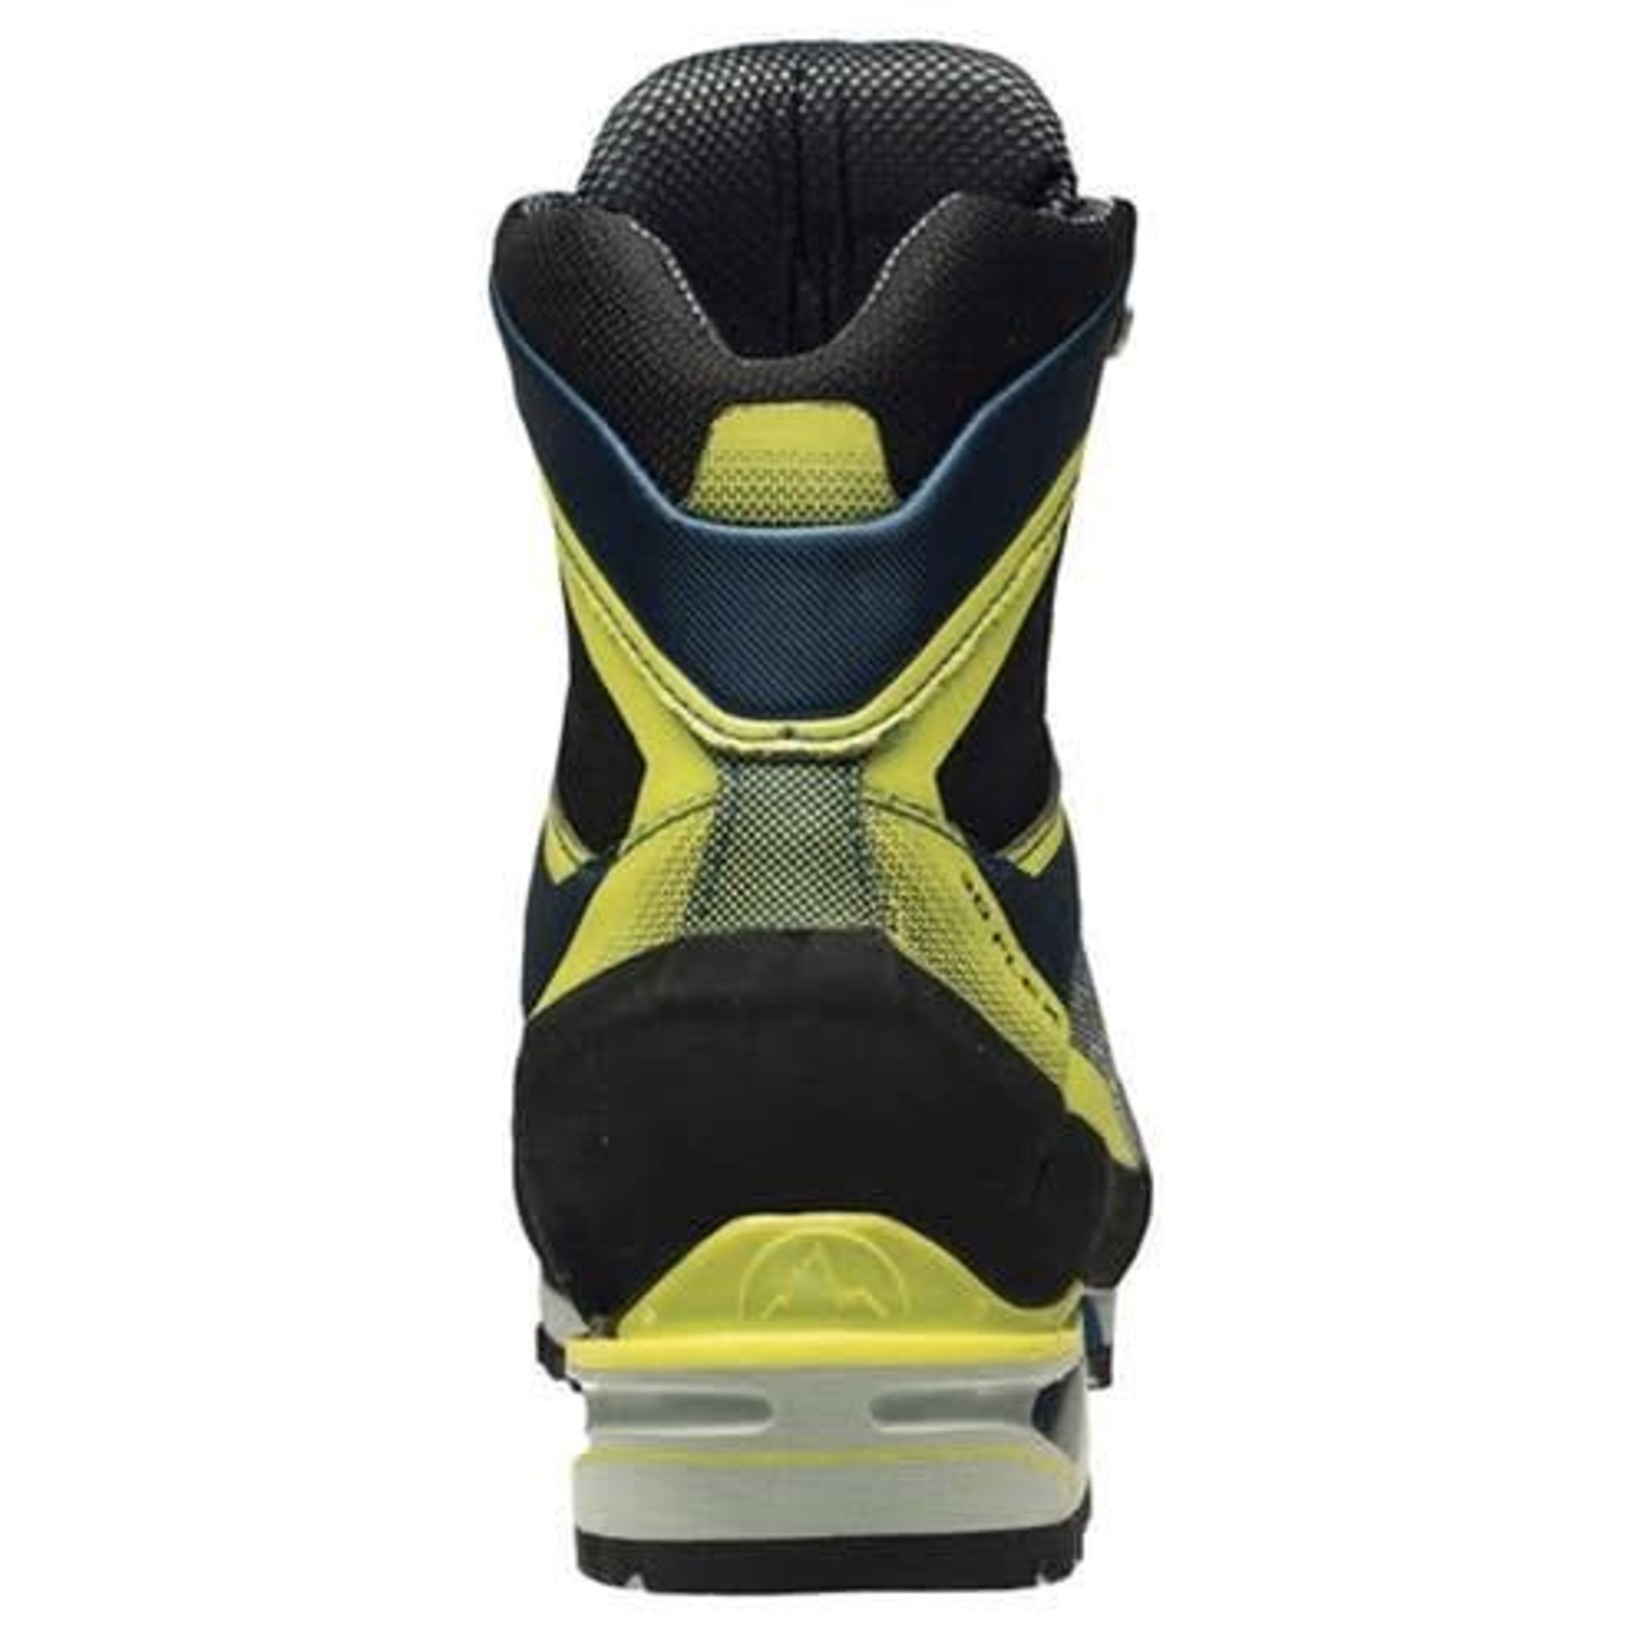 La Sportiva Botte alpine La Sportiva Trango Tower GTX - Homme